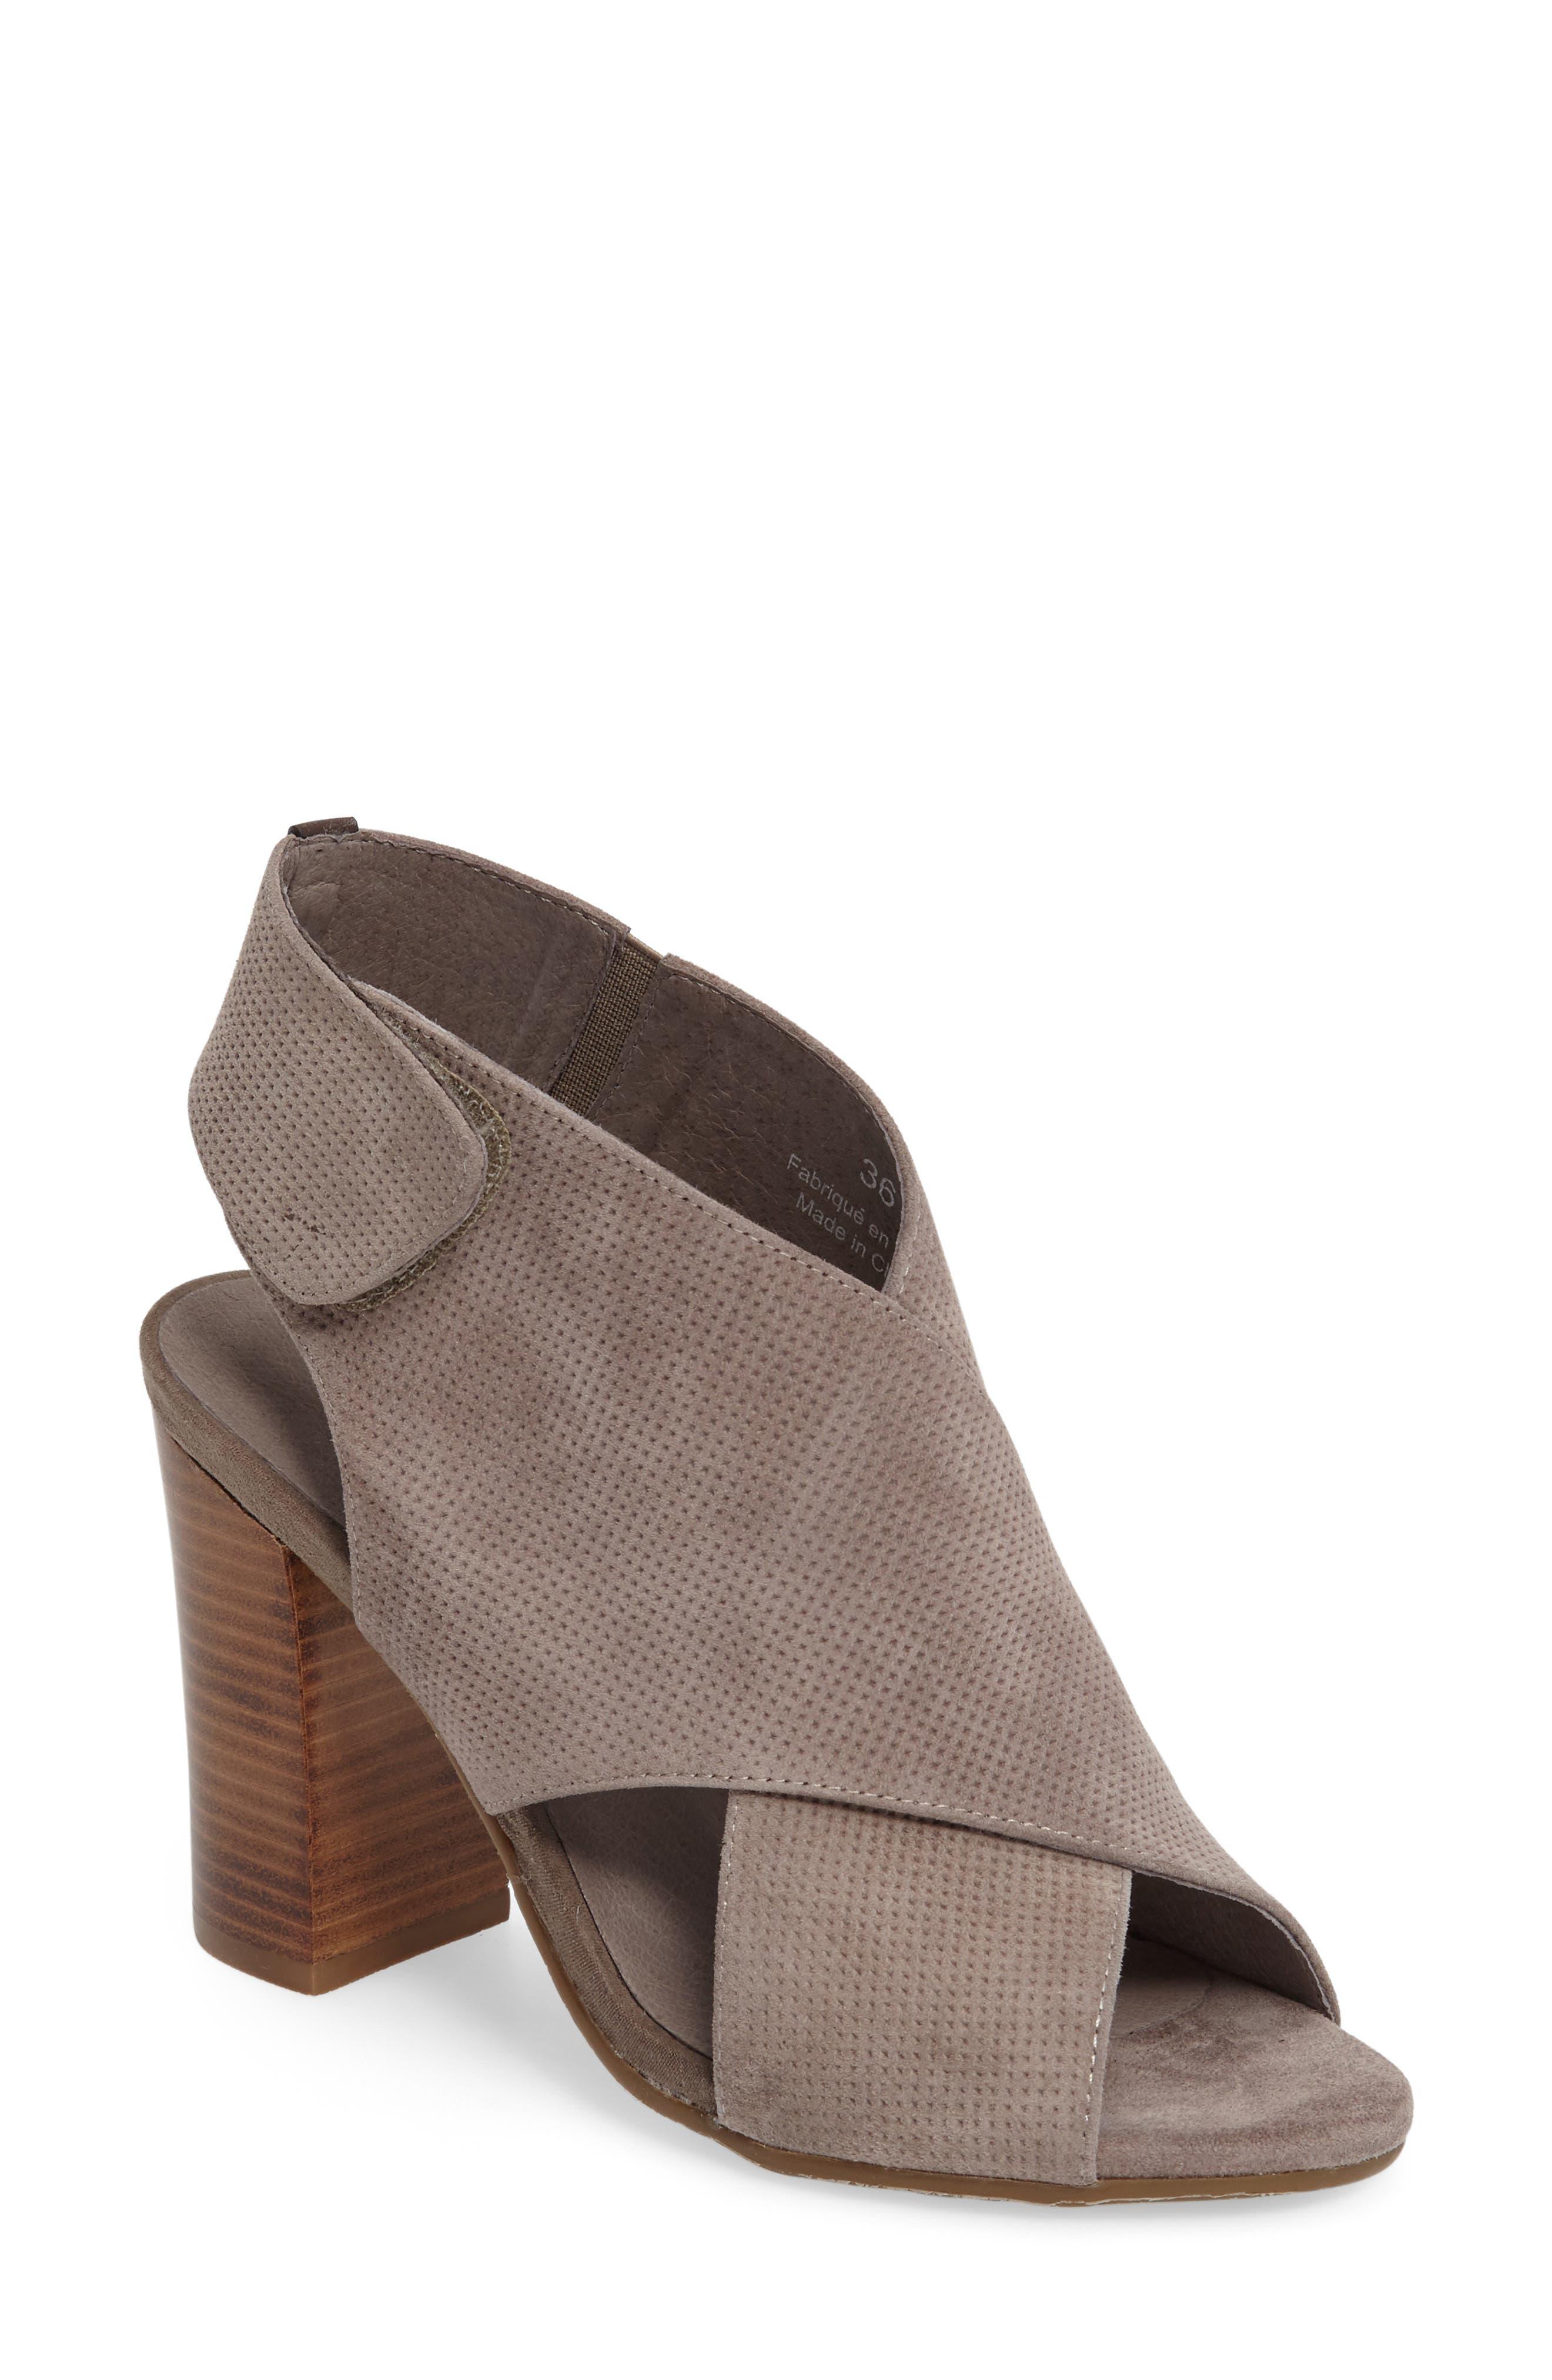 Main Image - Rudsak Benedetta Block Heel Sandal (Women)